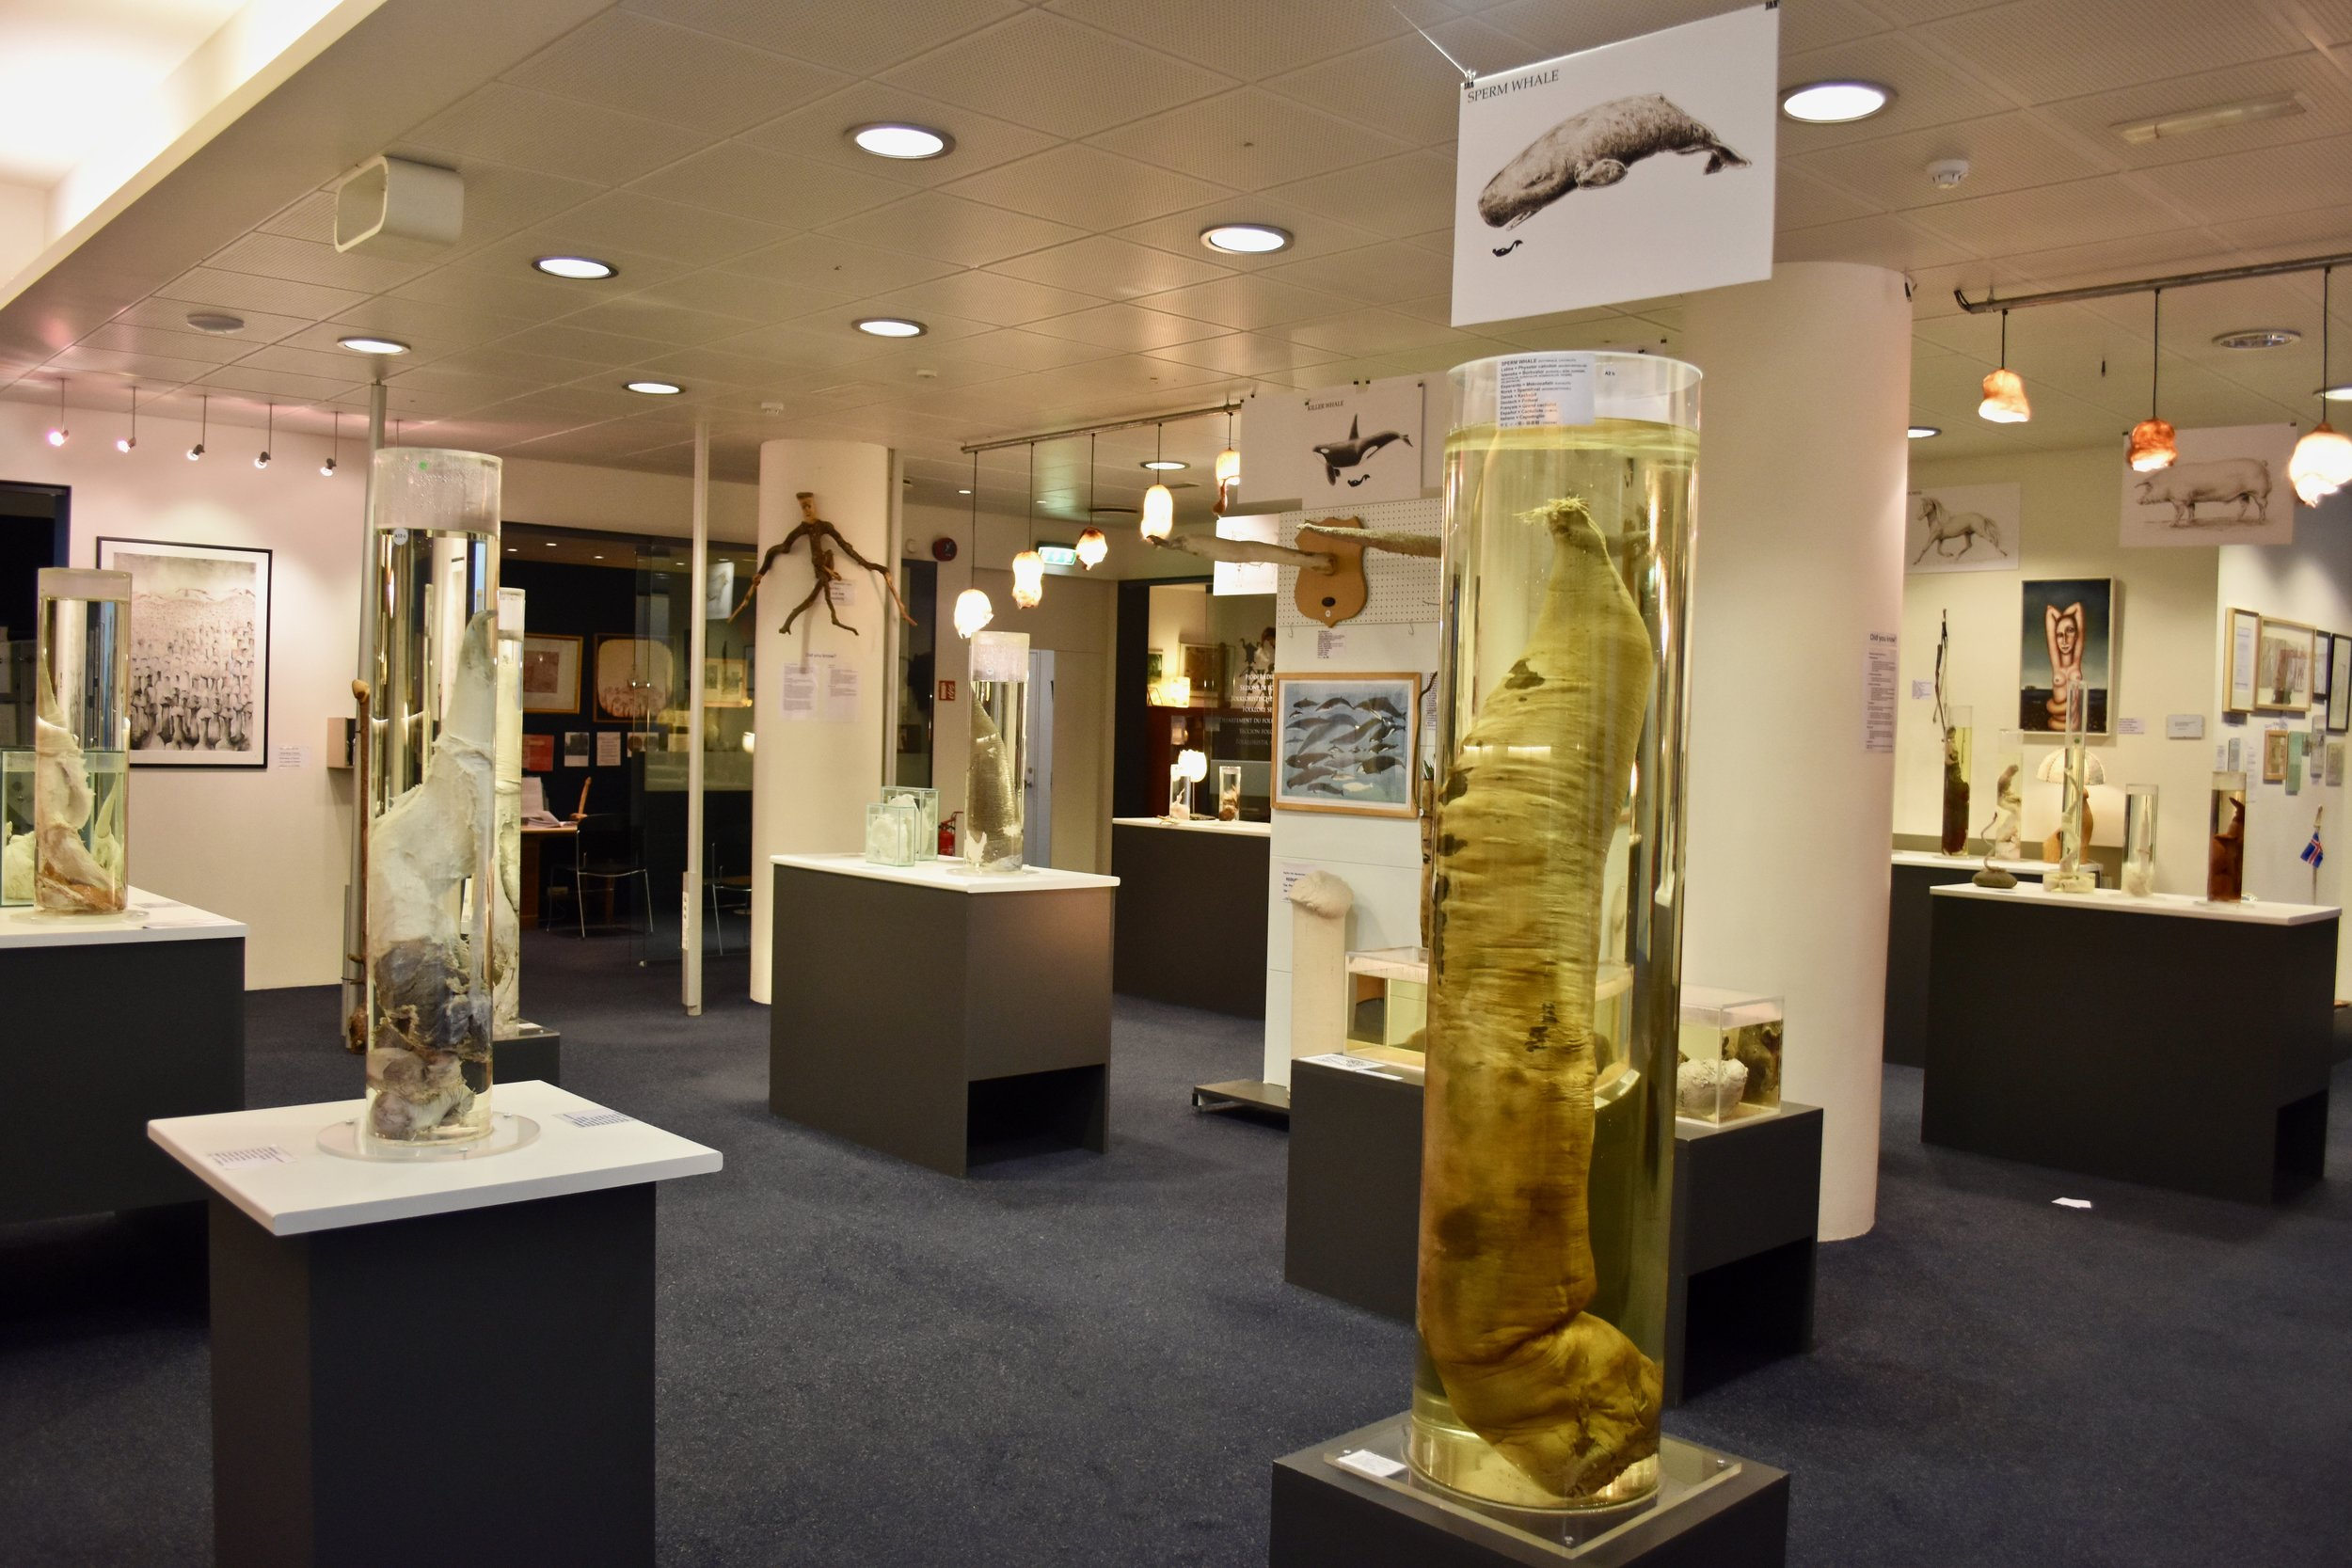 The Icelandic Phallological Museum in Reykjavik, Iceland